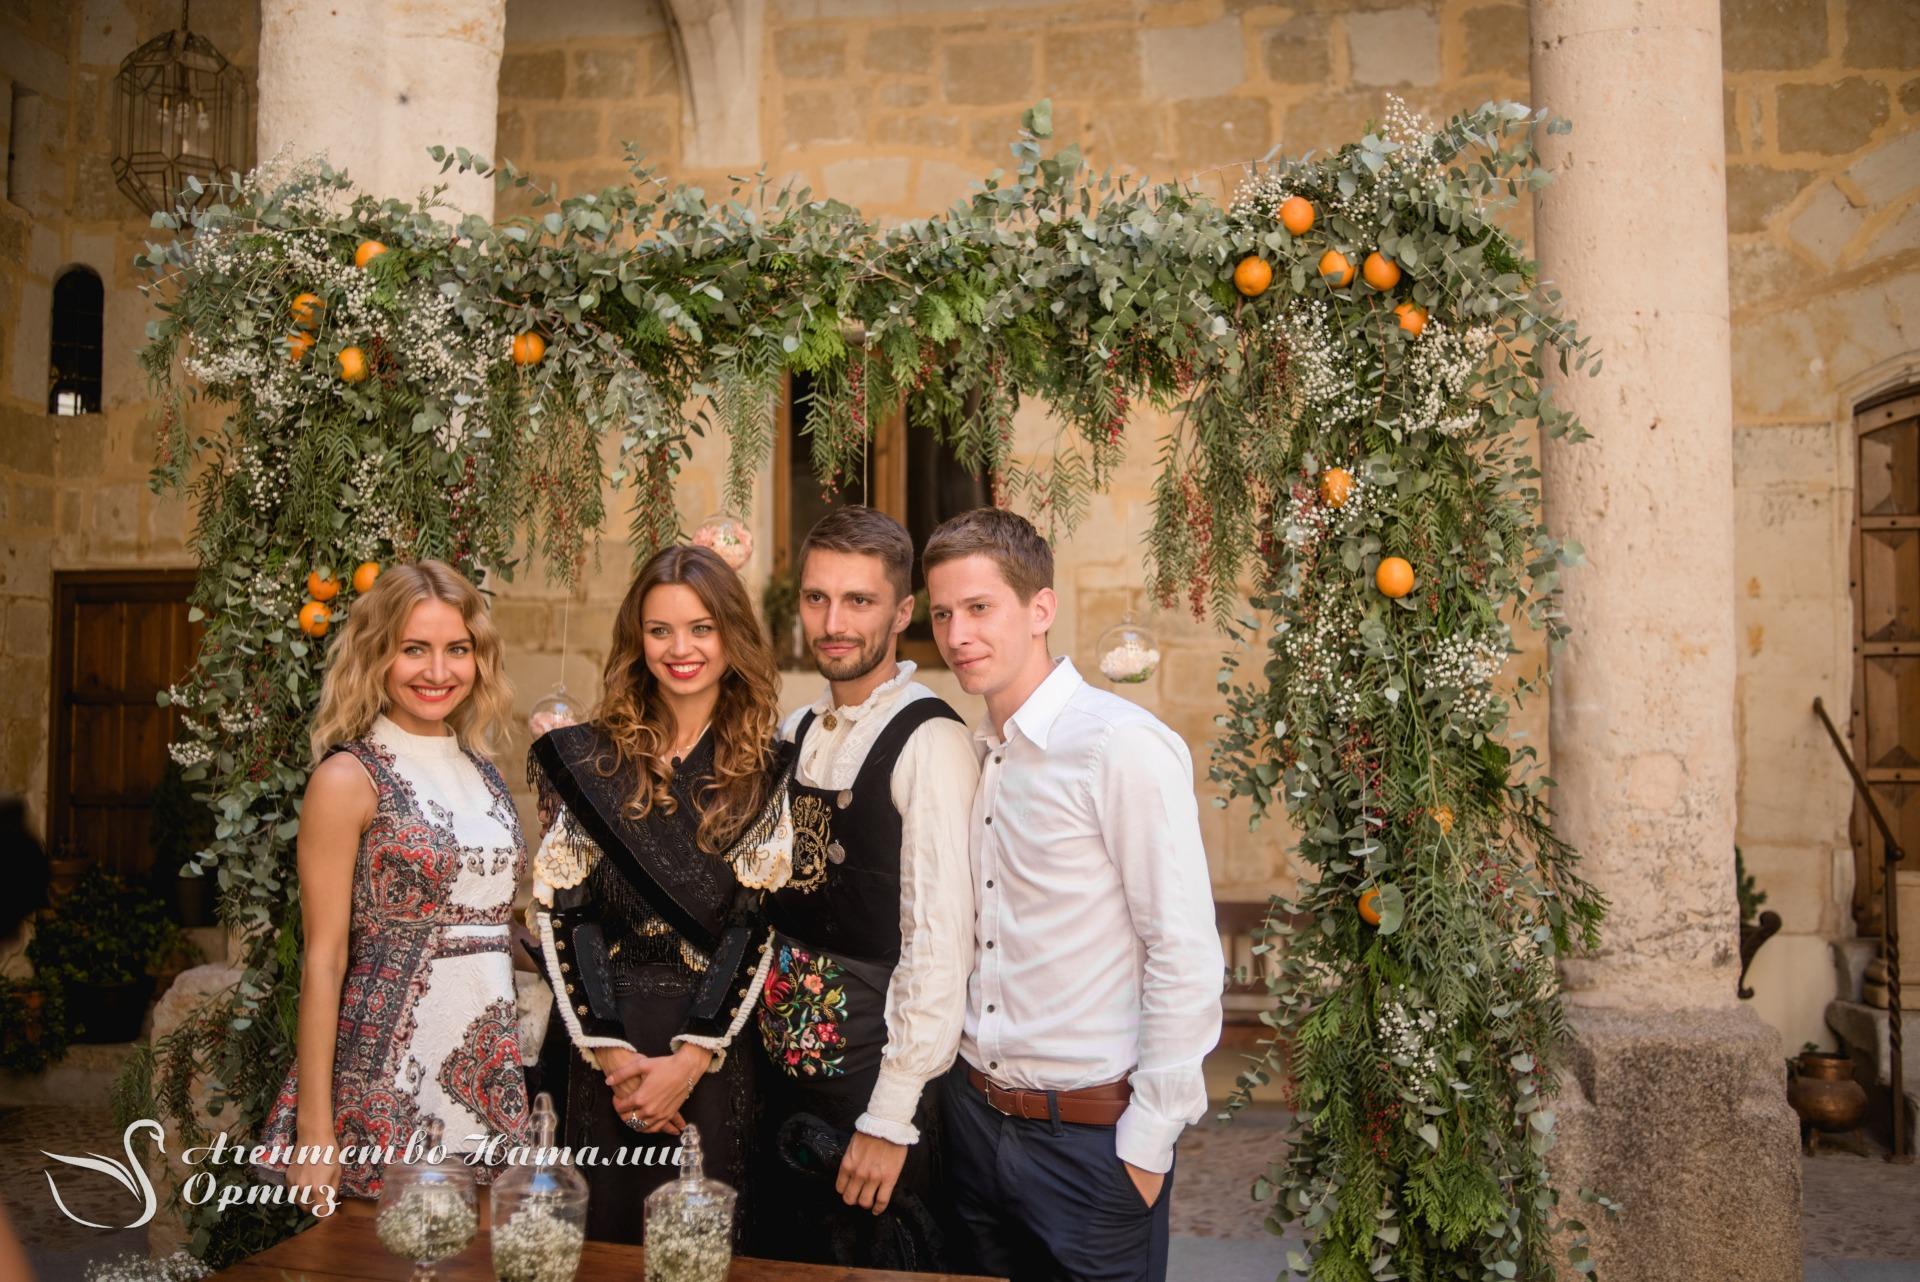 Жанна, пожени. Испания